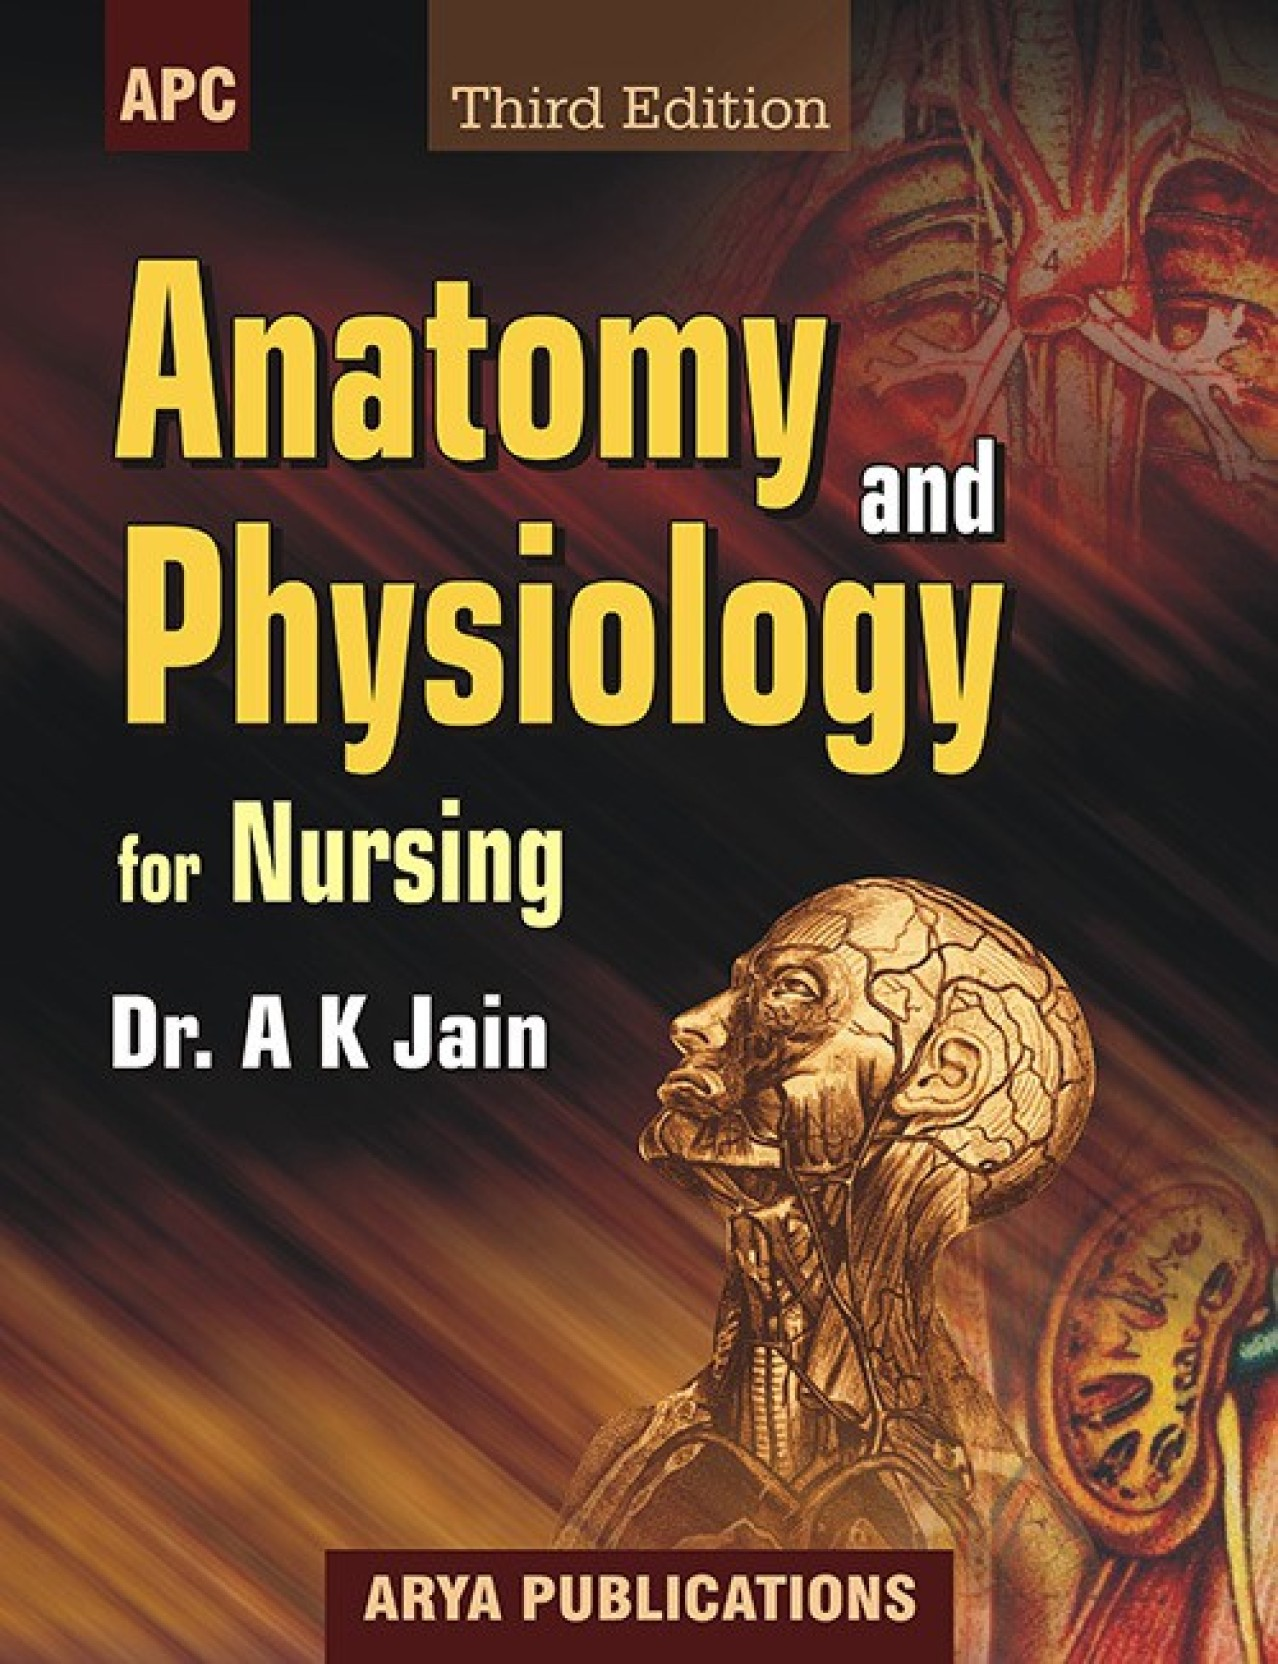 Schön Fundamentals Of Anatomy And Physiology 3rd Edition Ideen ...